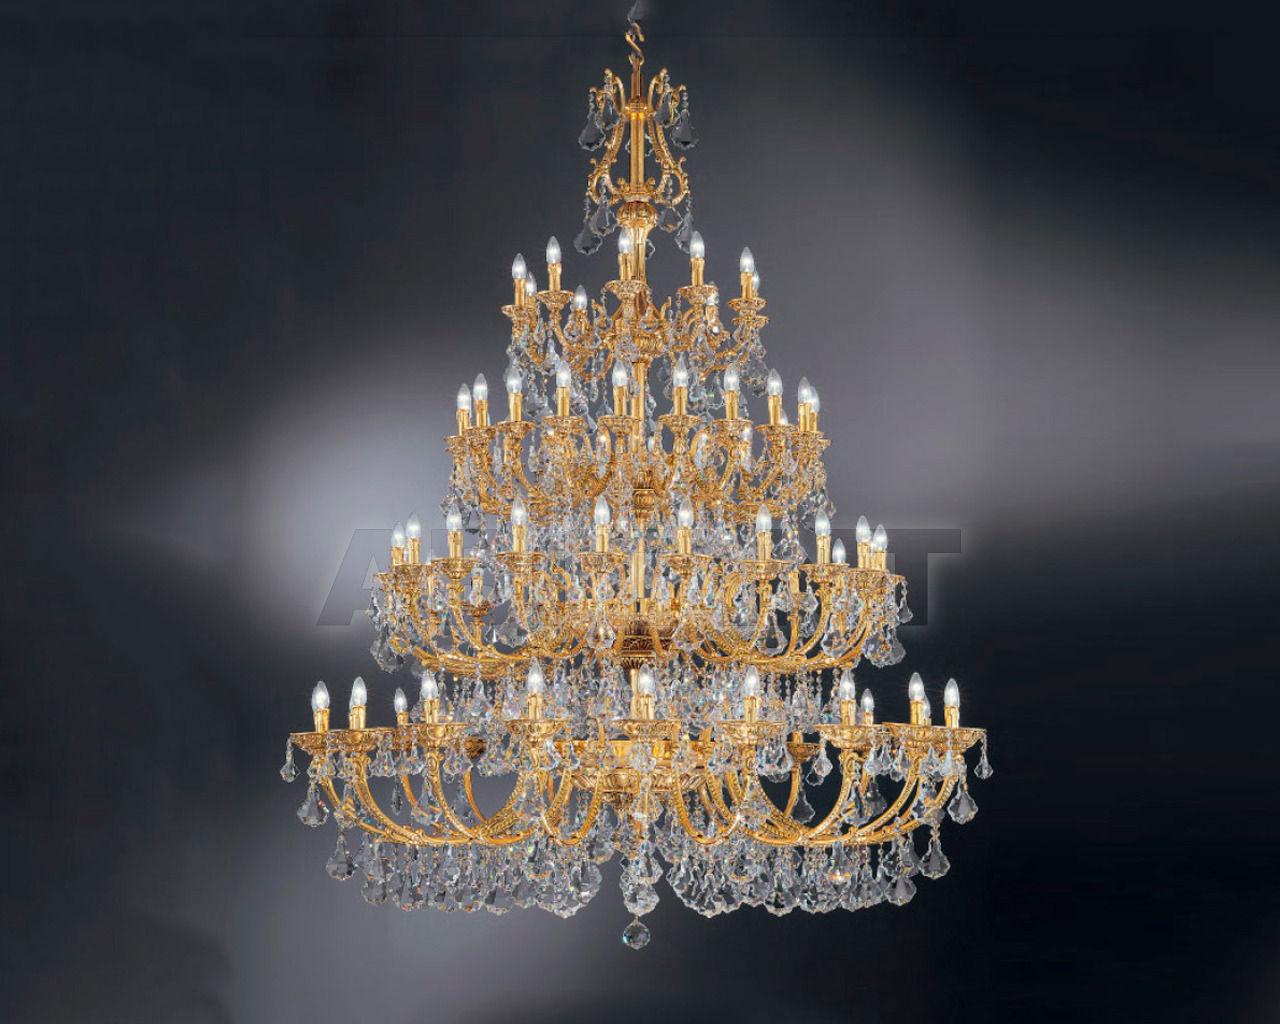 Купить Люстра Asfour Crystal Crystal 2013 CH 5110/70  GOLD PATINA PEND 902